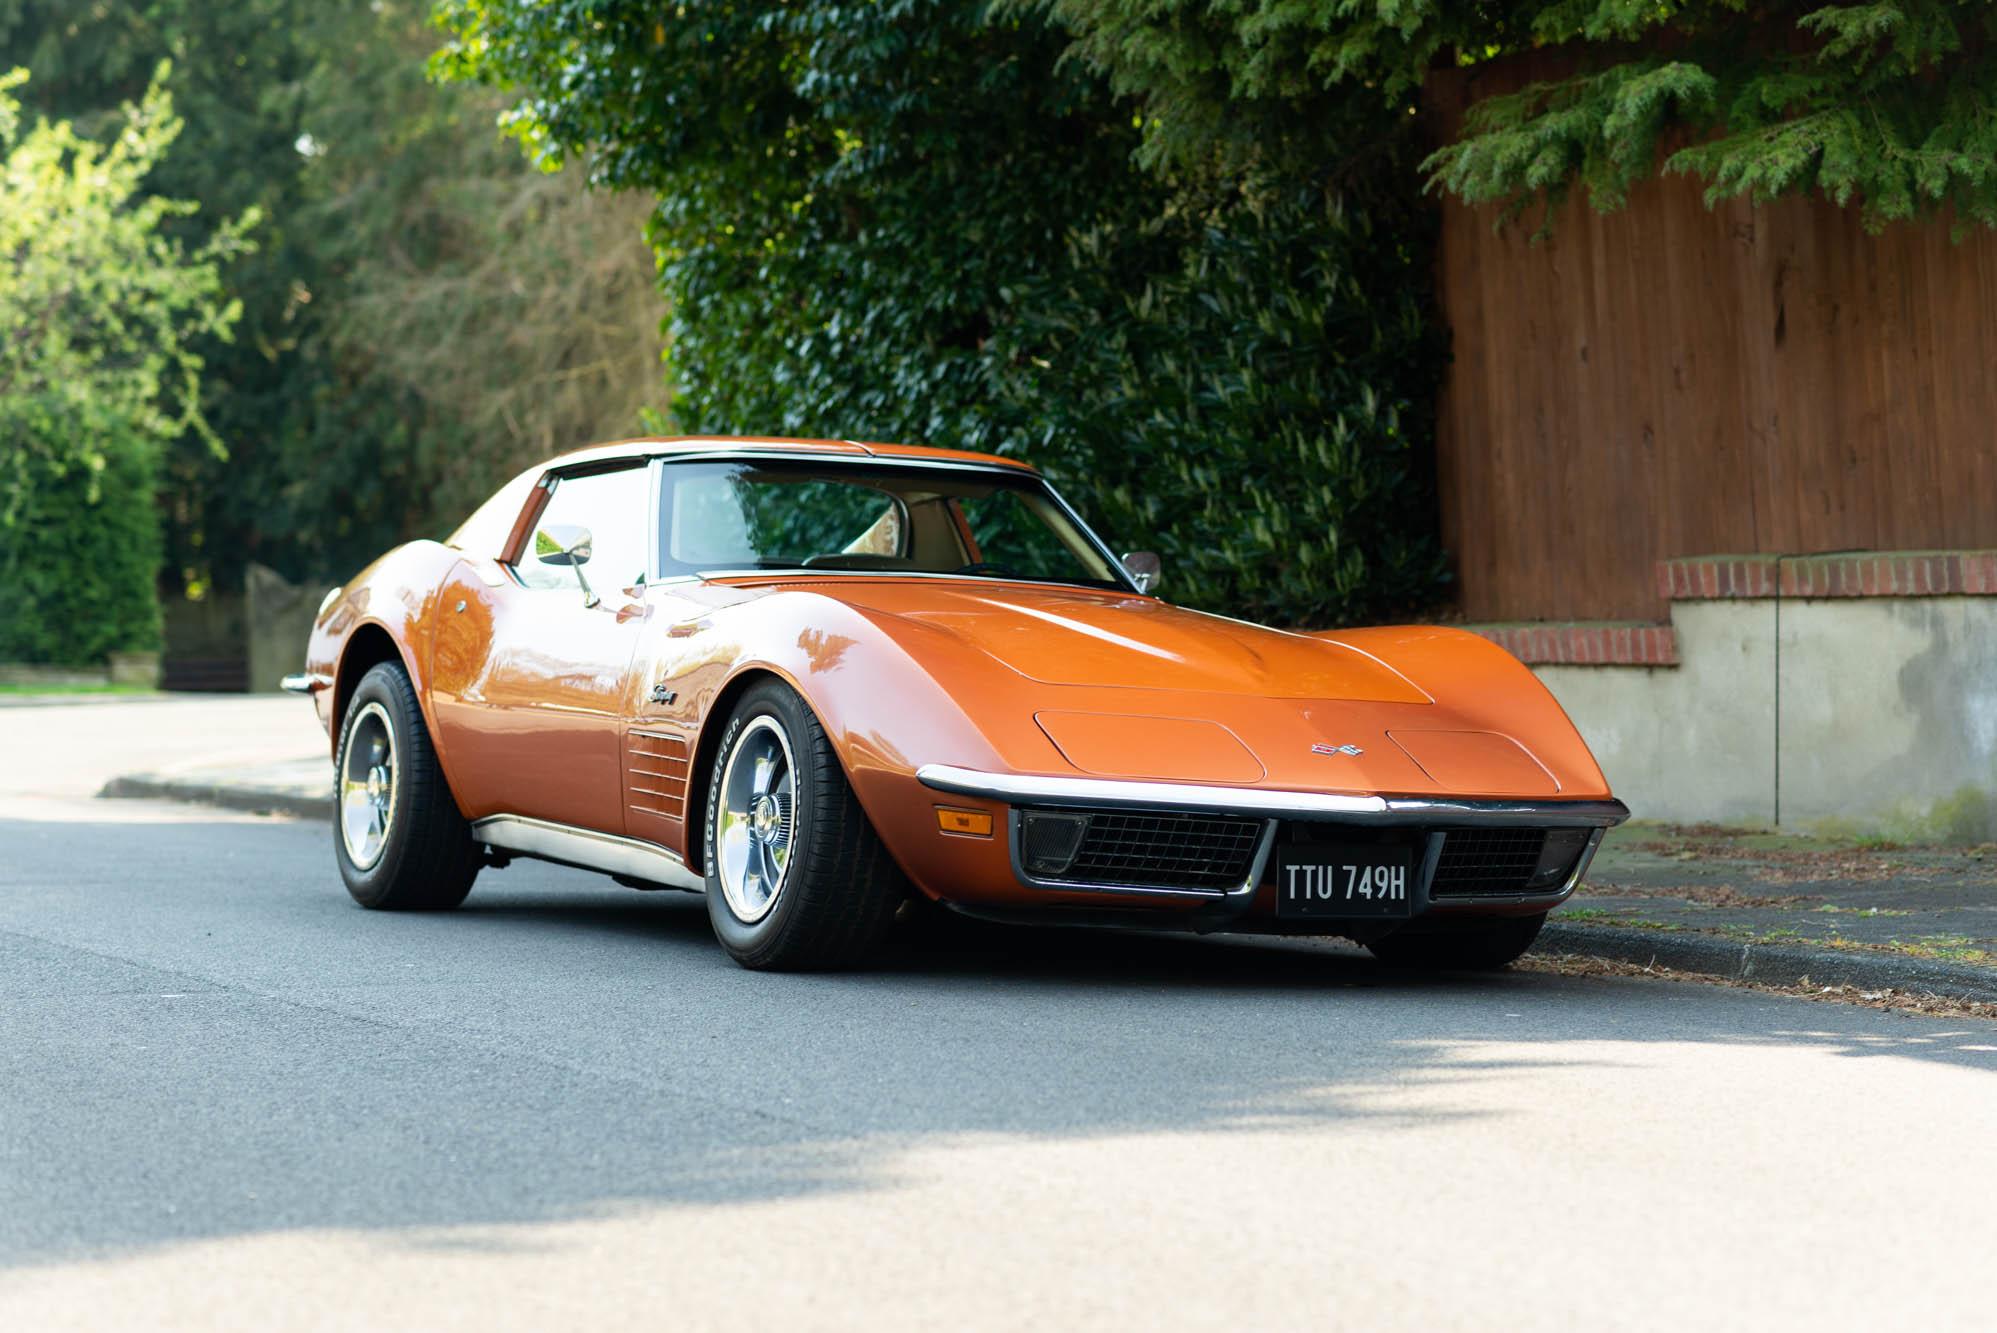 Kekurangan Chevrolet Corvette 1970 Perbandingan Harga